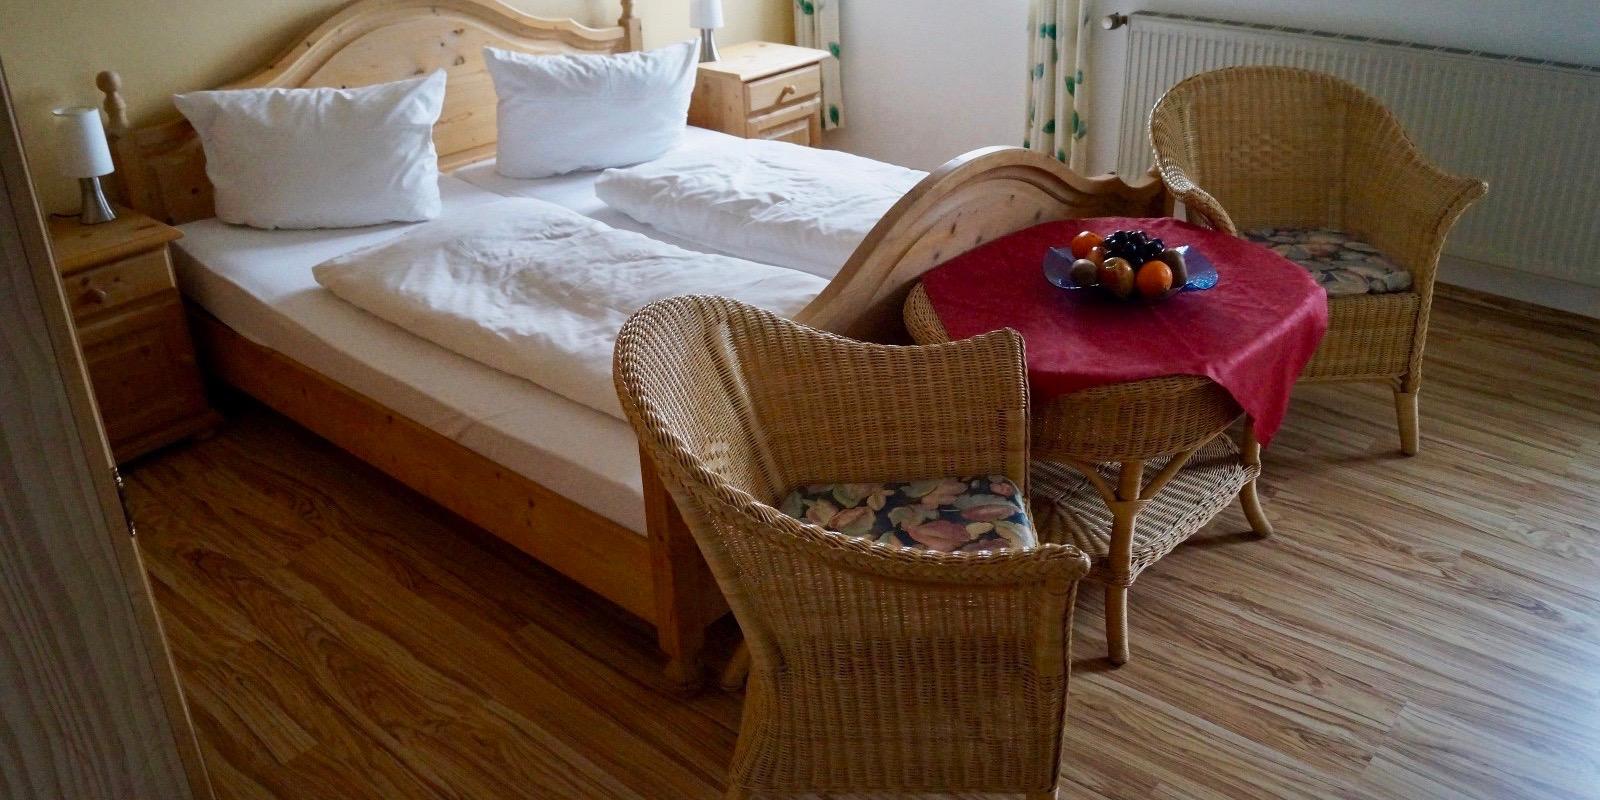 http://hotel-katzenstein.de/wp-content/uploads/2017/08/DZ_Comfort_28x4.jpg